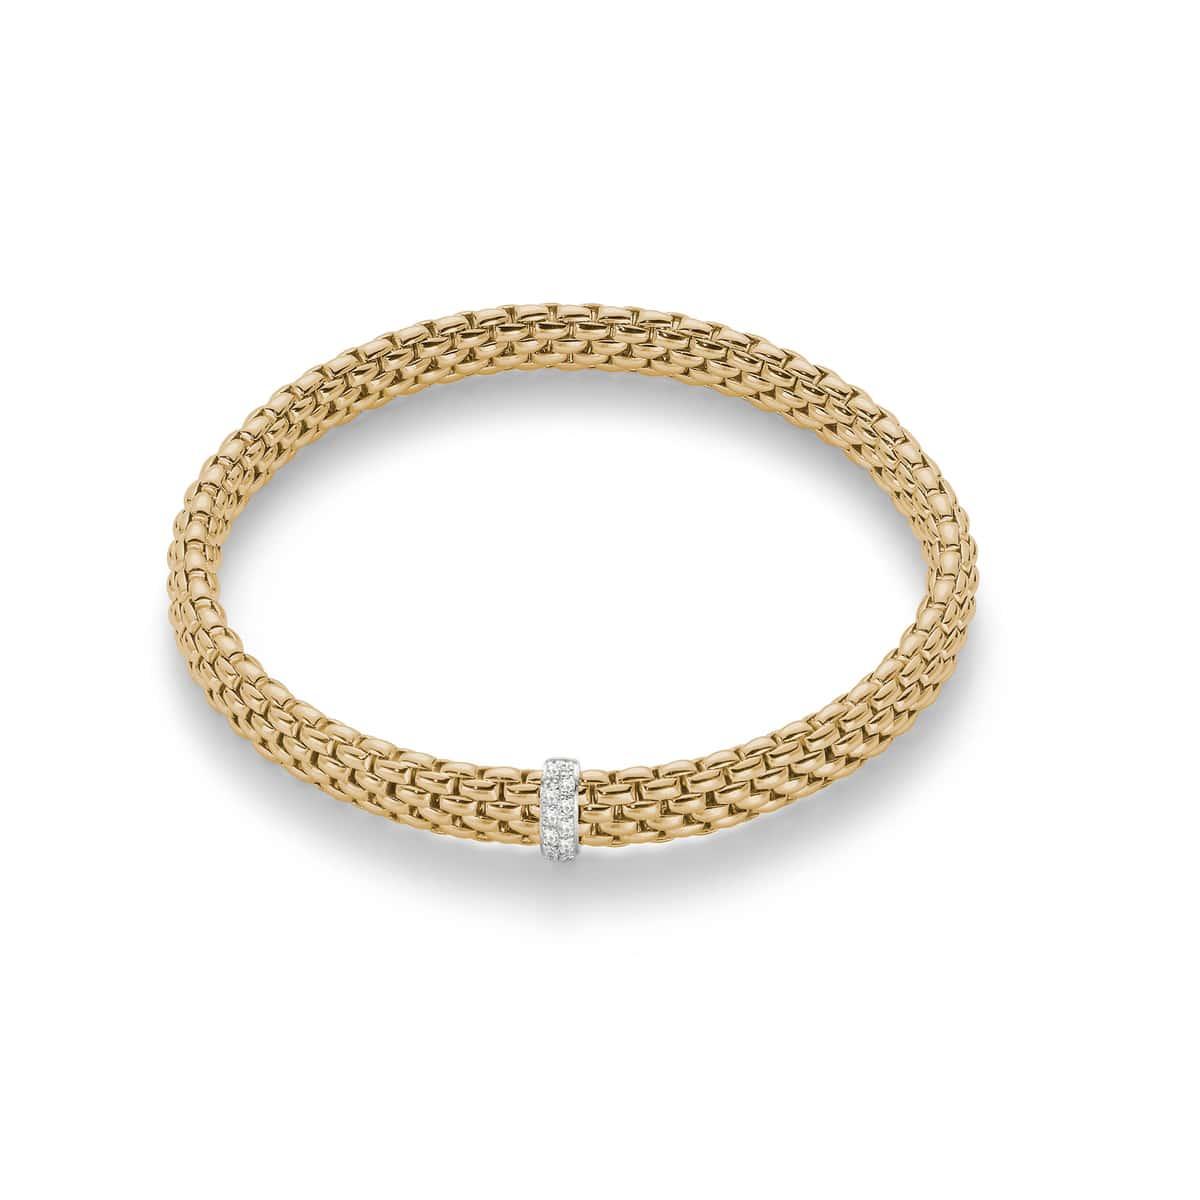 Fope 18K Yellow Gold Flex‰'it Vendome Bracelet with Diamond